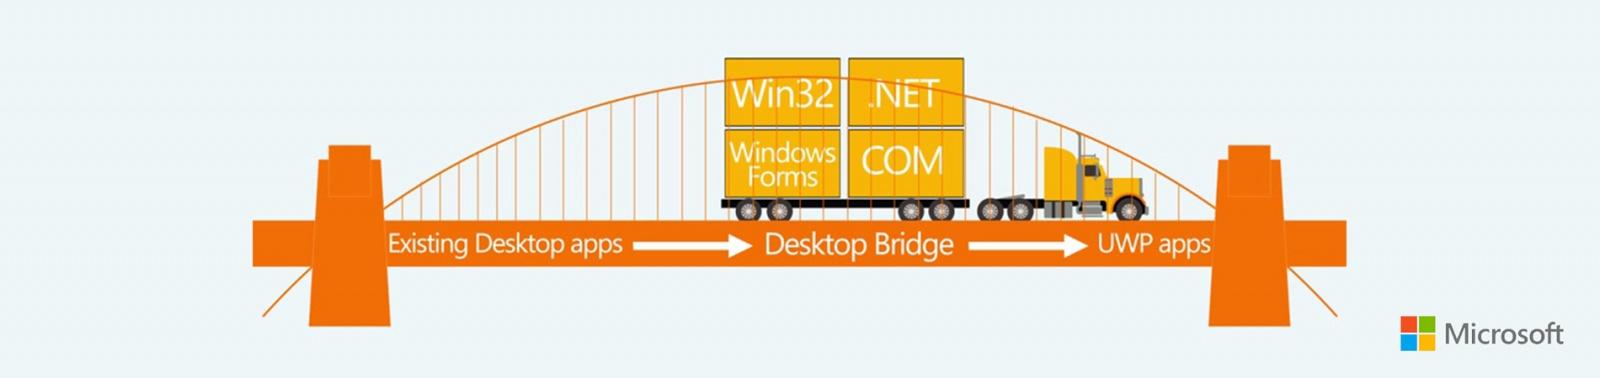 Project Centennial: мост из Win32 и .NET к Windows Store и UWP - 1